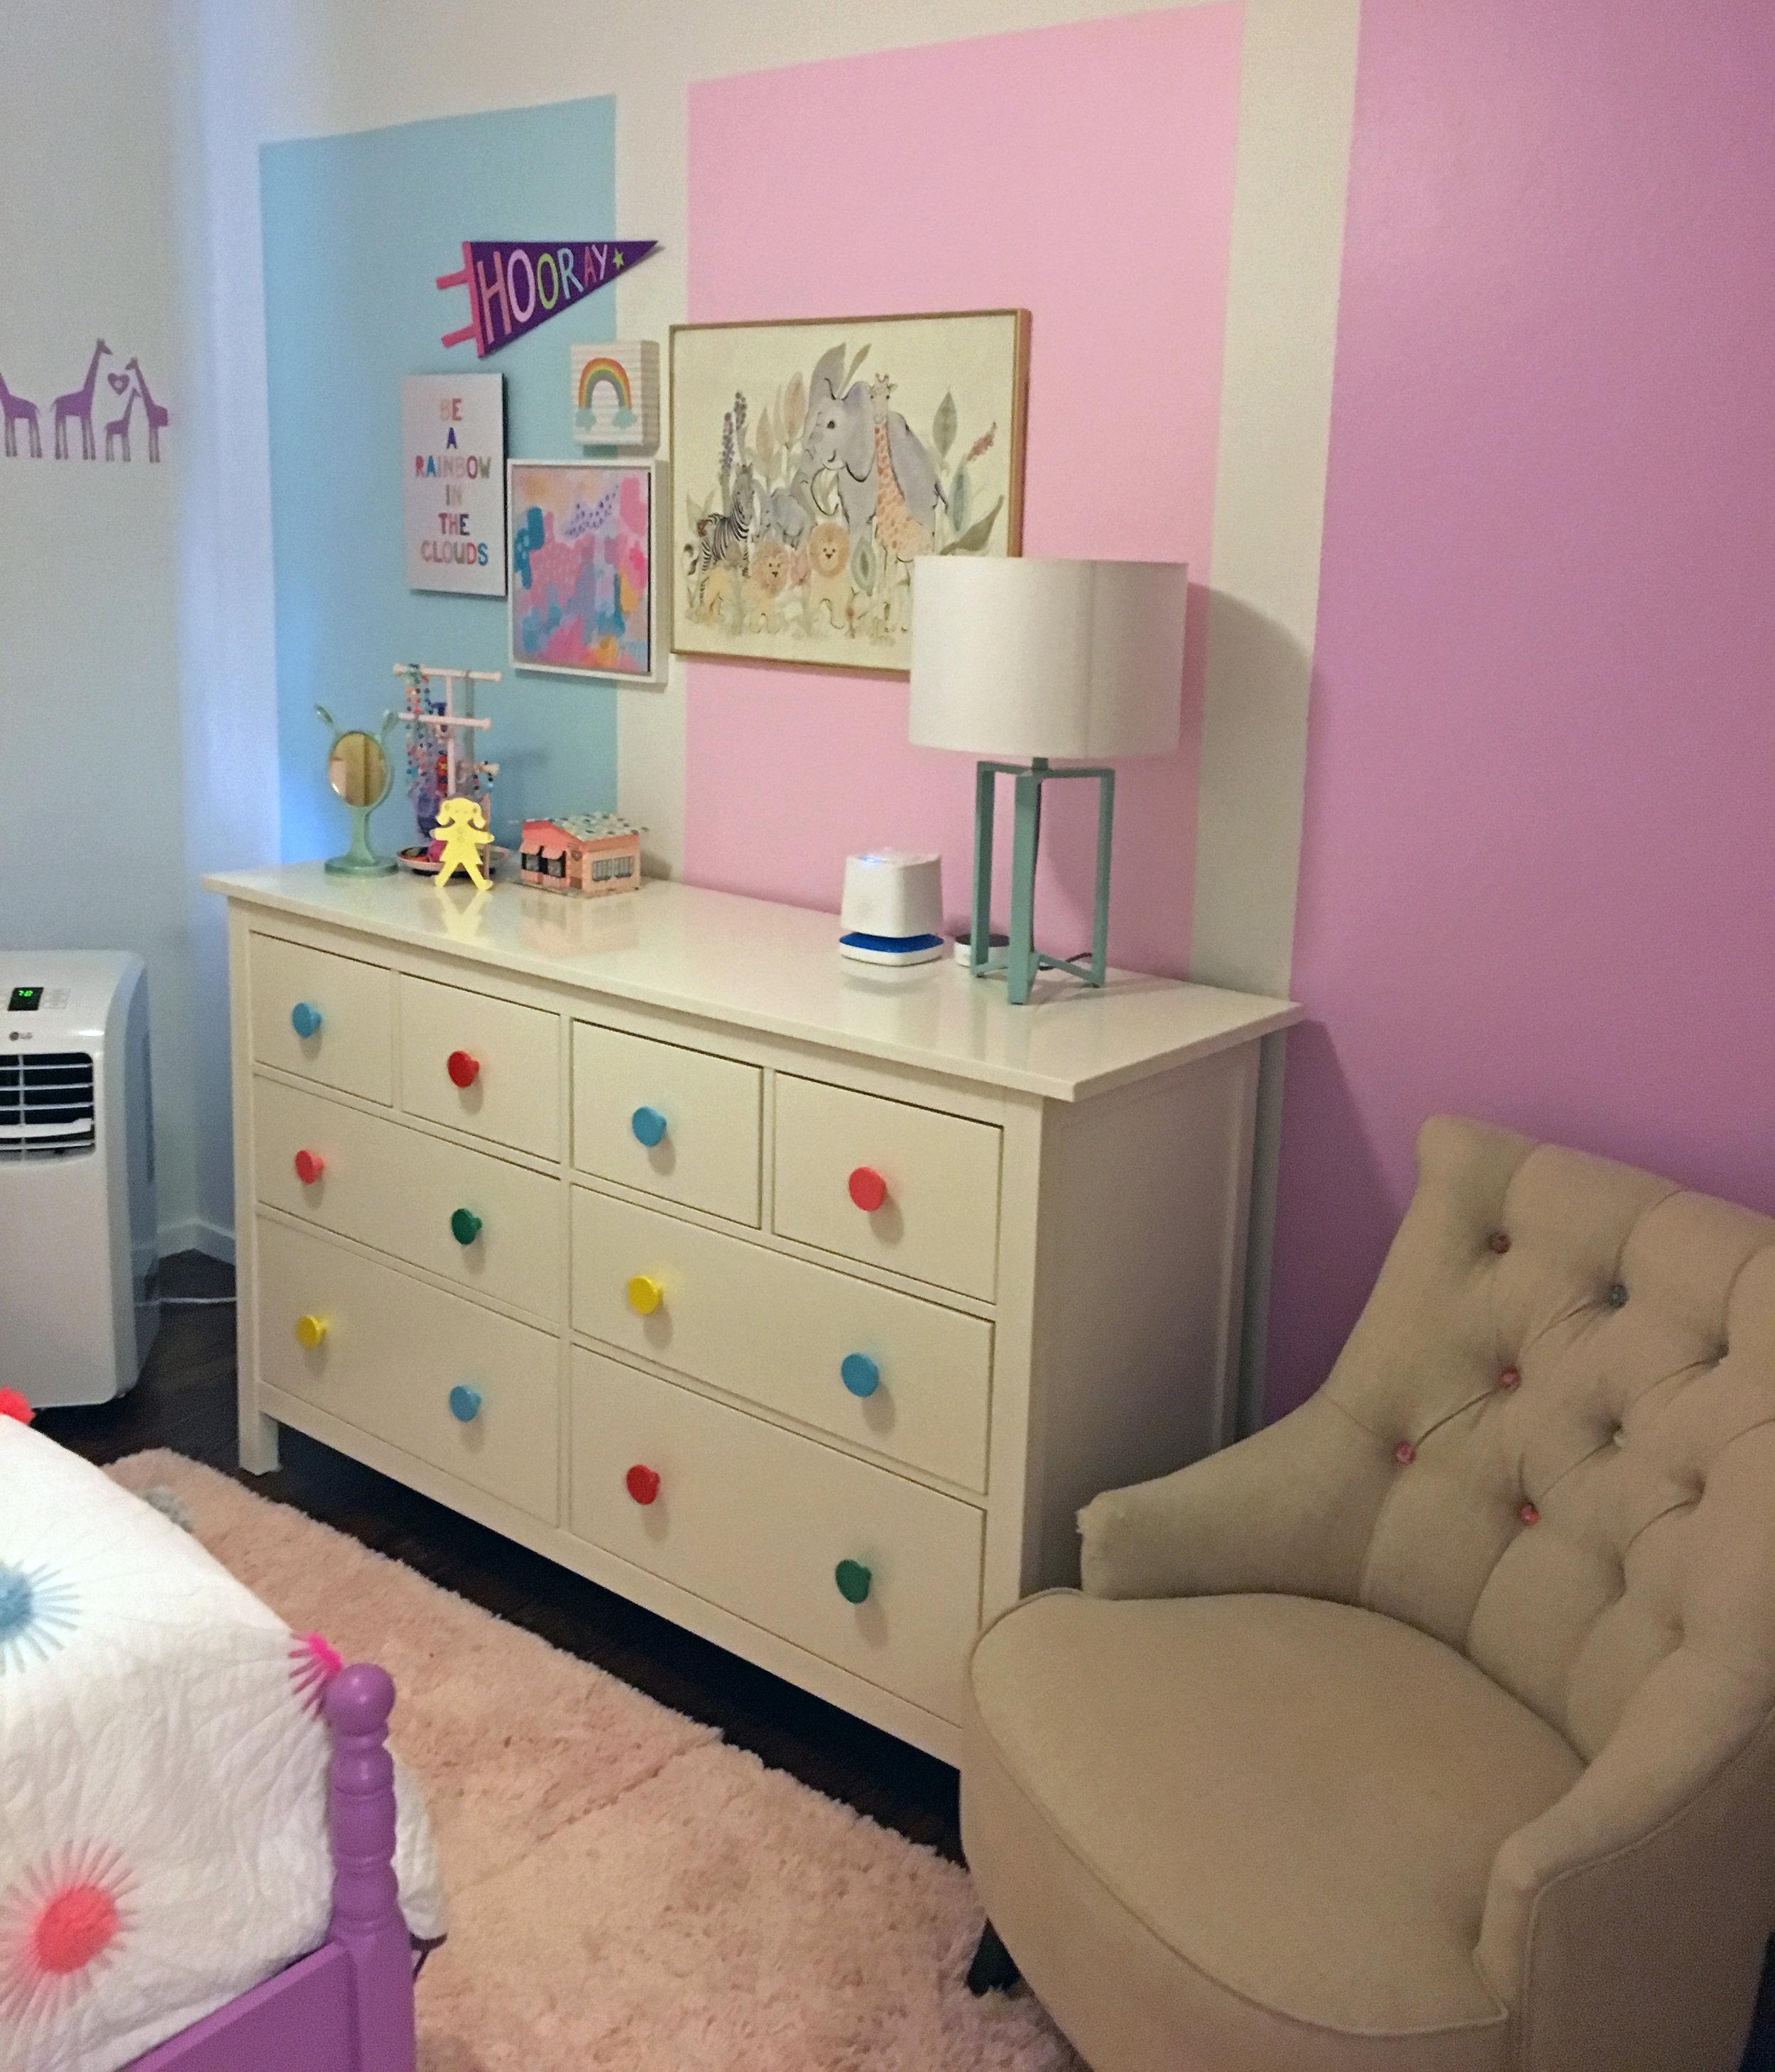 emerson's room1.jpg